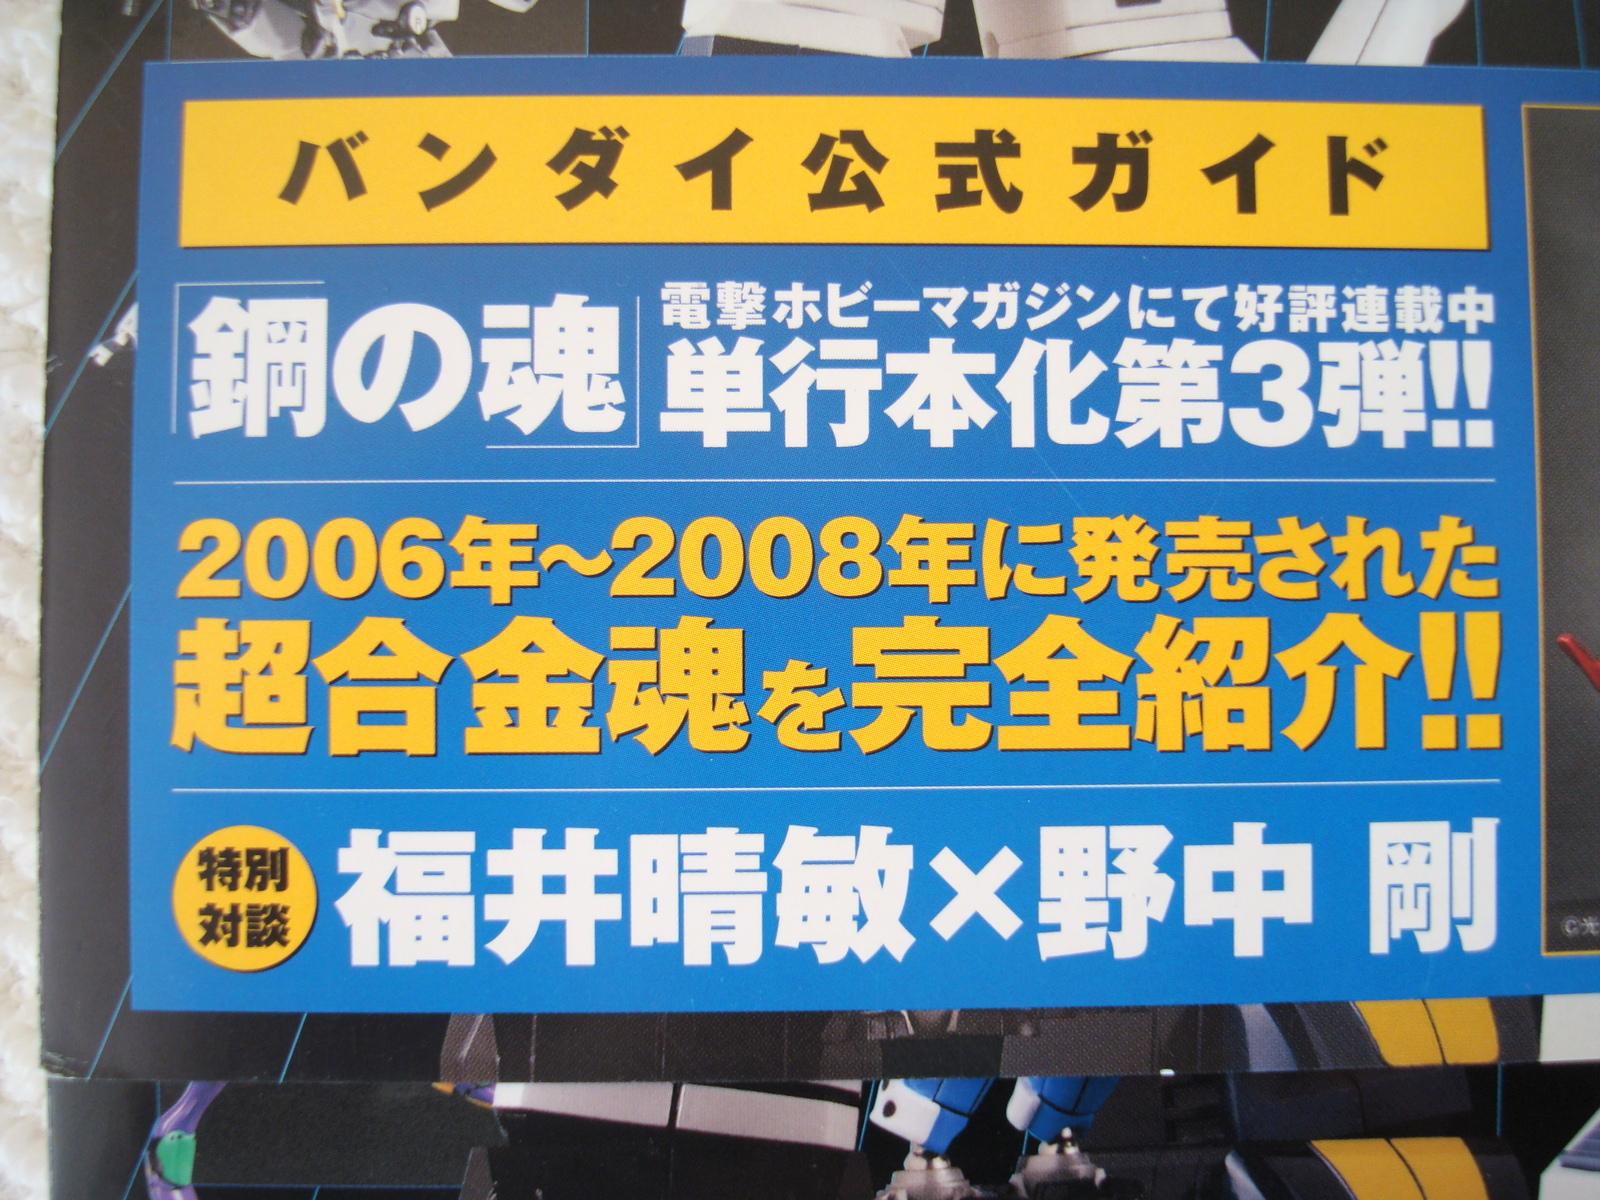 JAPANESE HOBBY MAGAZINE: PROJECT THE SOUL OF CHOGOKIN